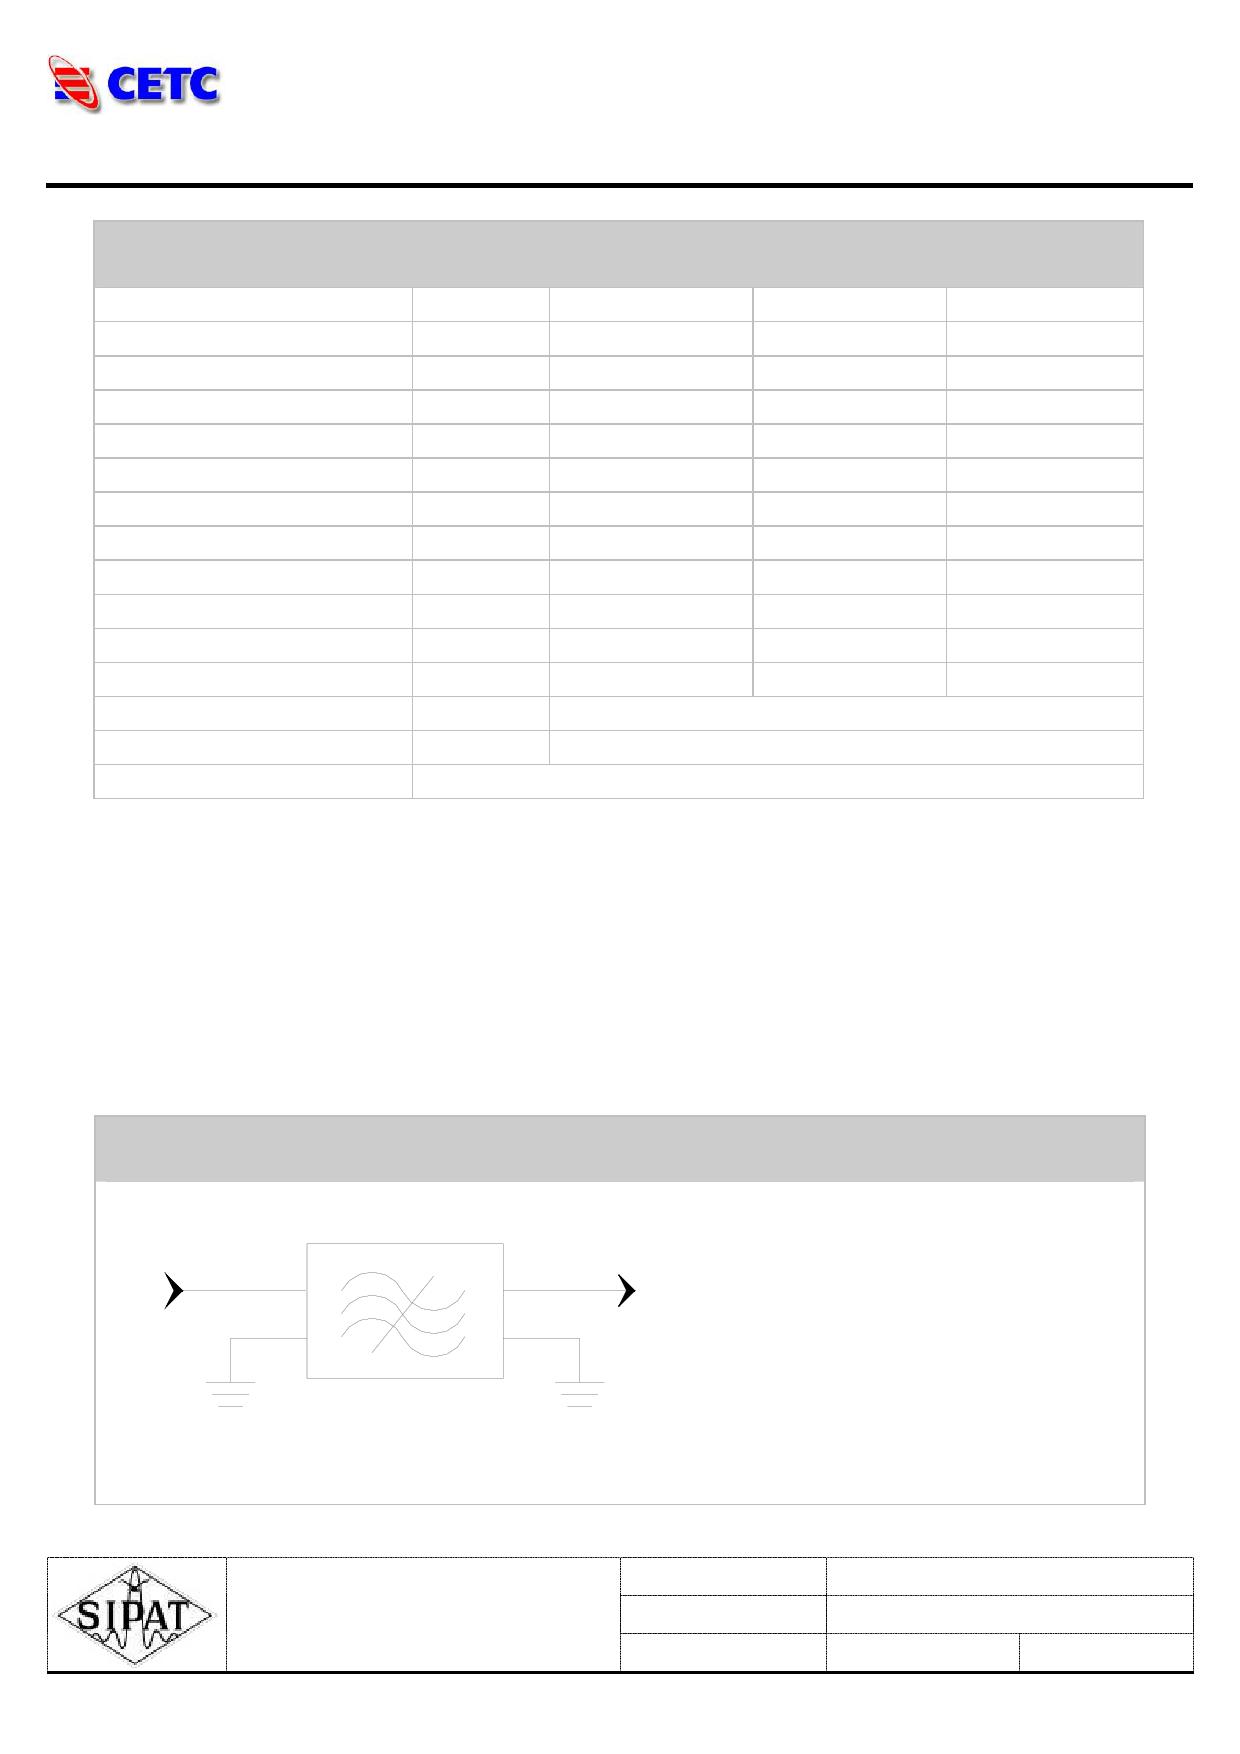 LBN7025 datasheet